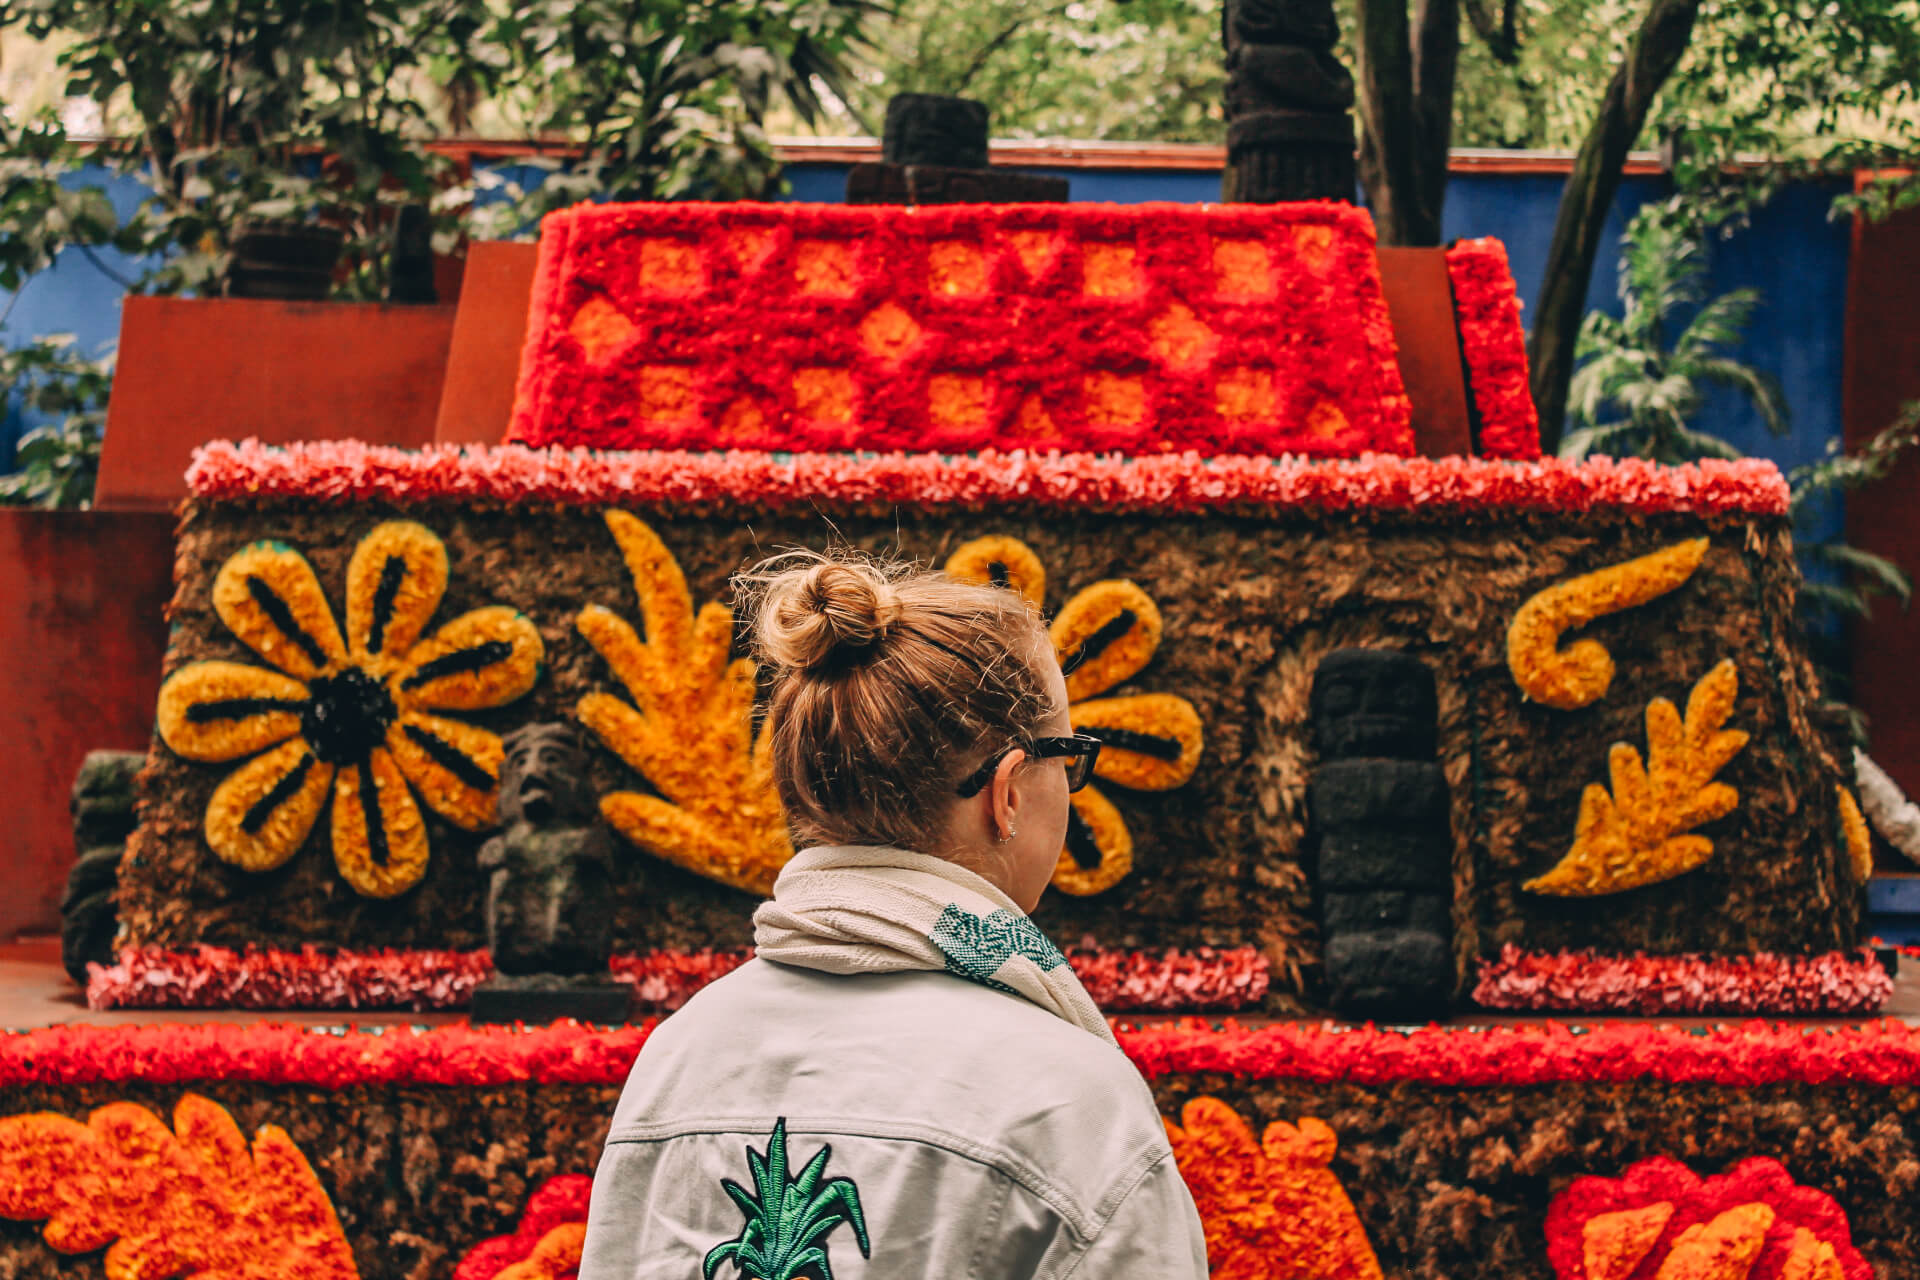 La Casa Azul | Frida Kahlo's House in Mexico City